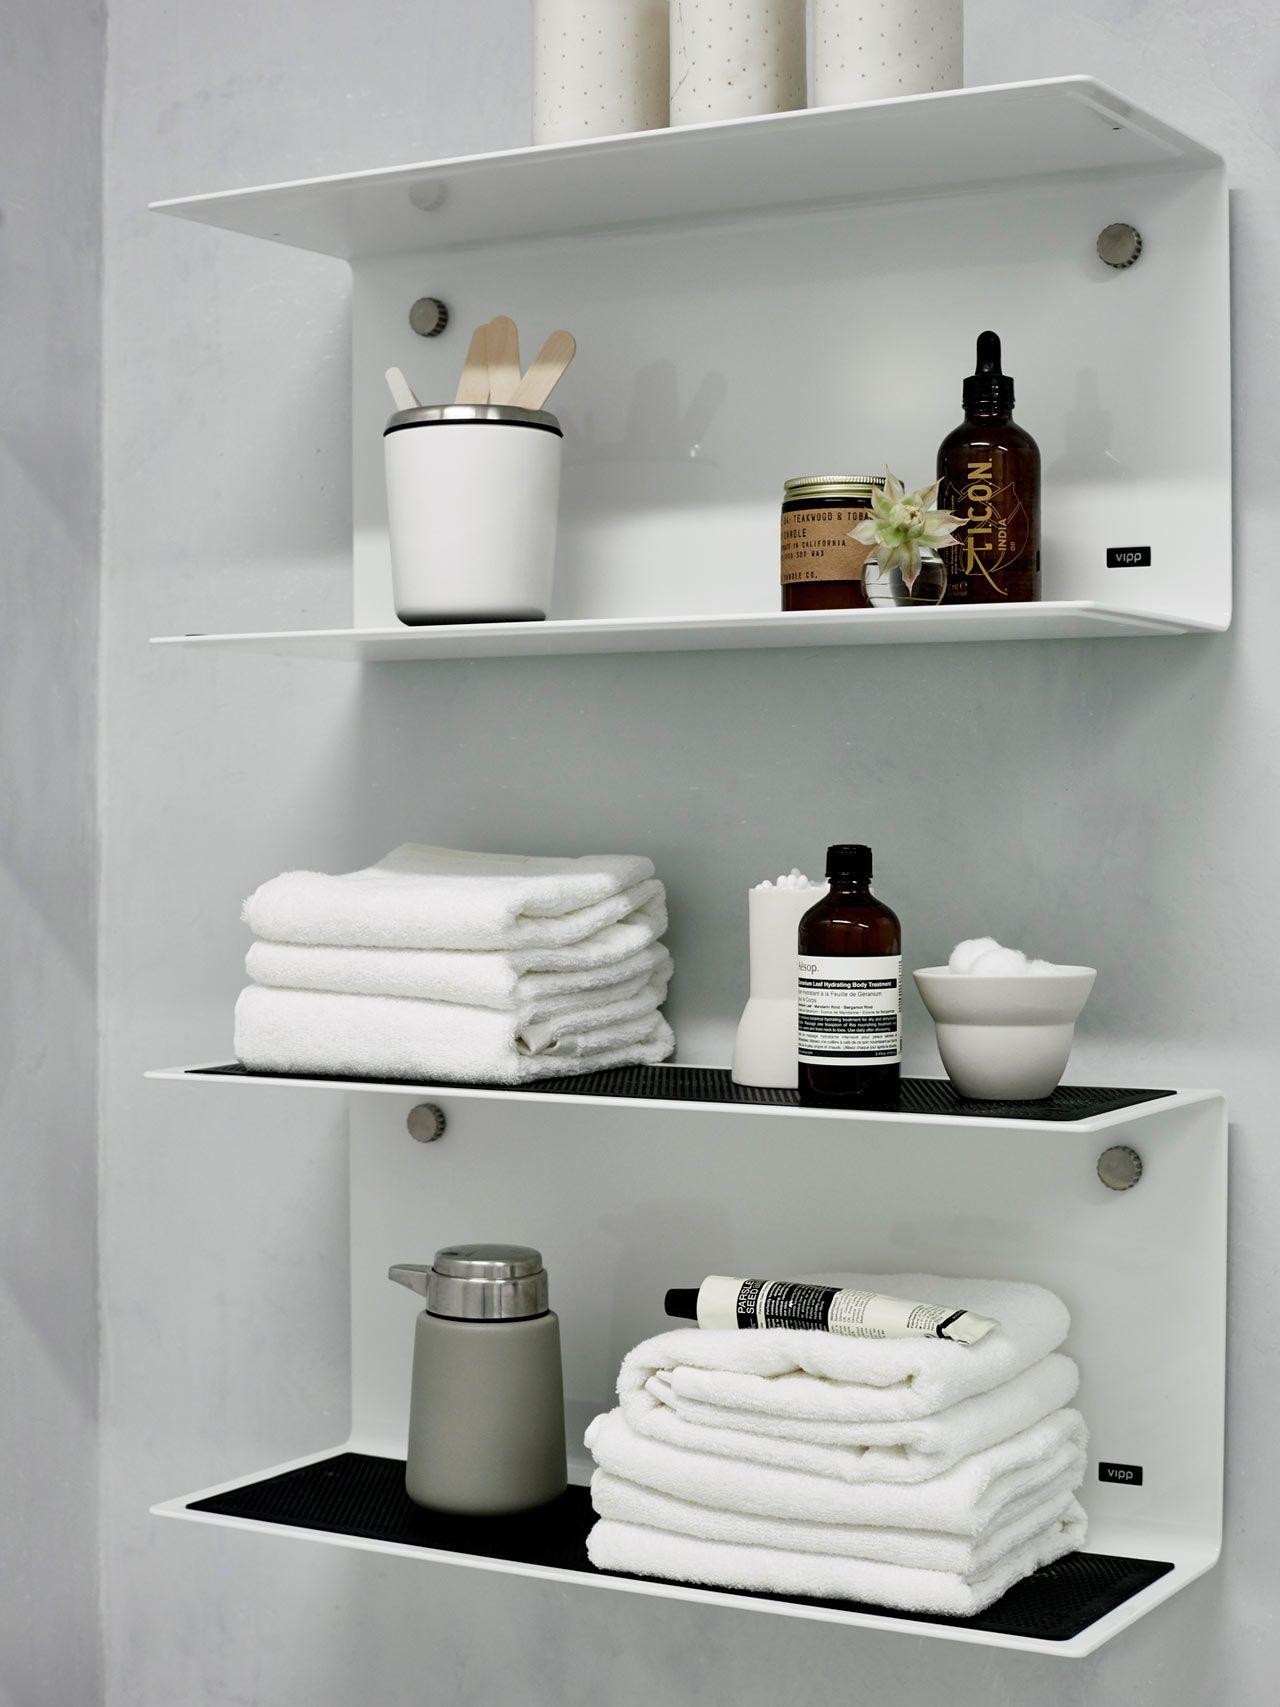 Vipp Showroom Nyc 11 Design Milk Kitchen Shelf Design Ikea Interior Bathroom Design